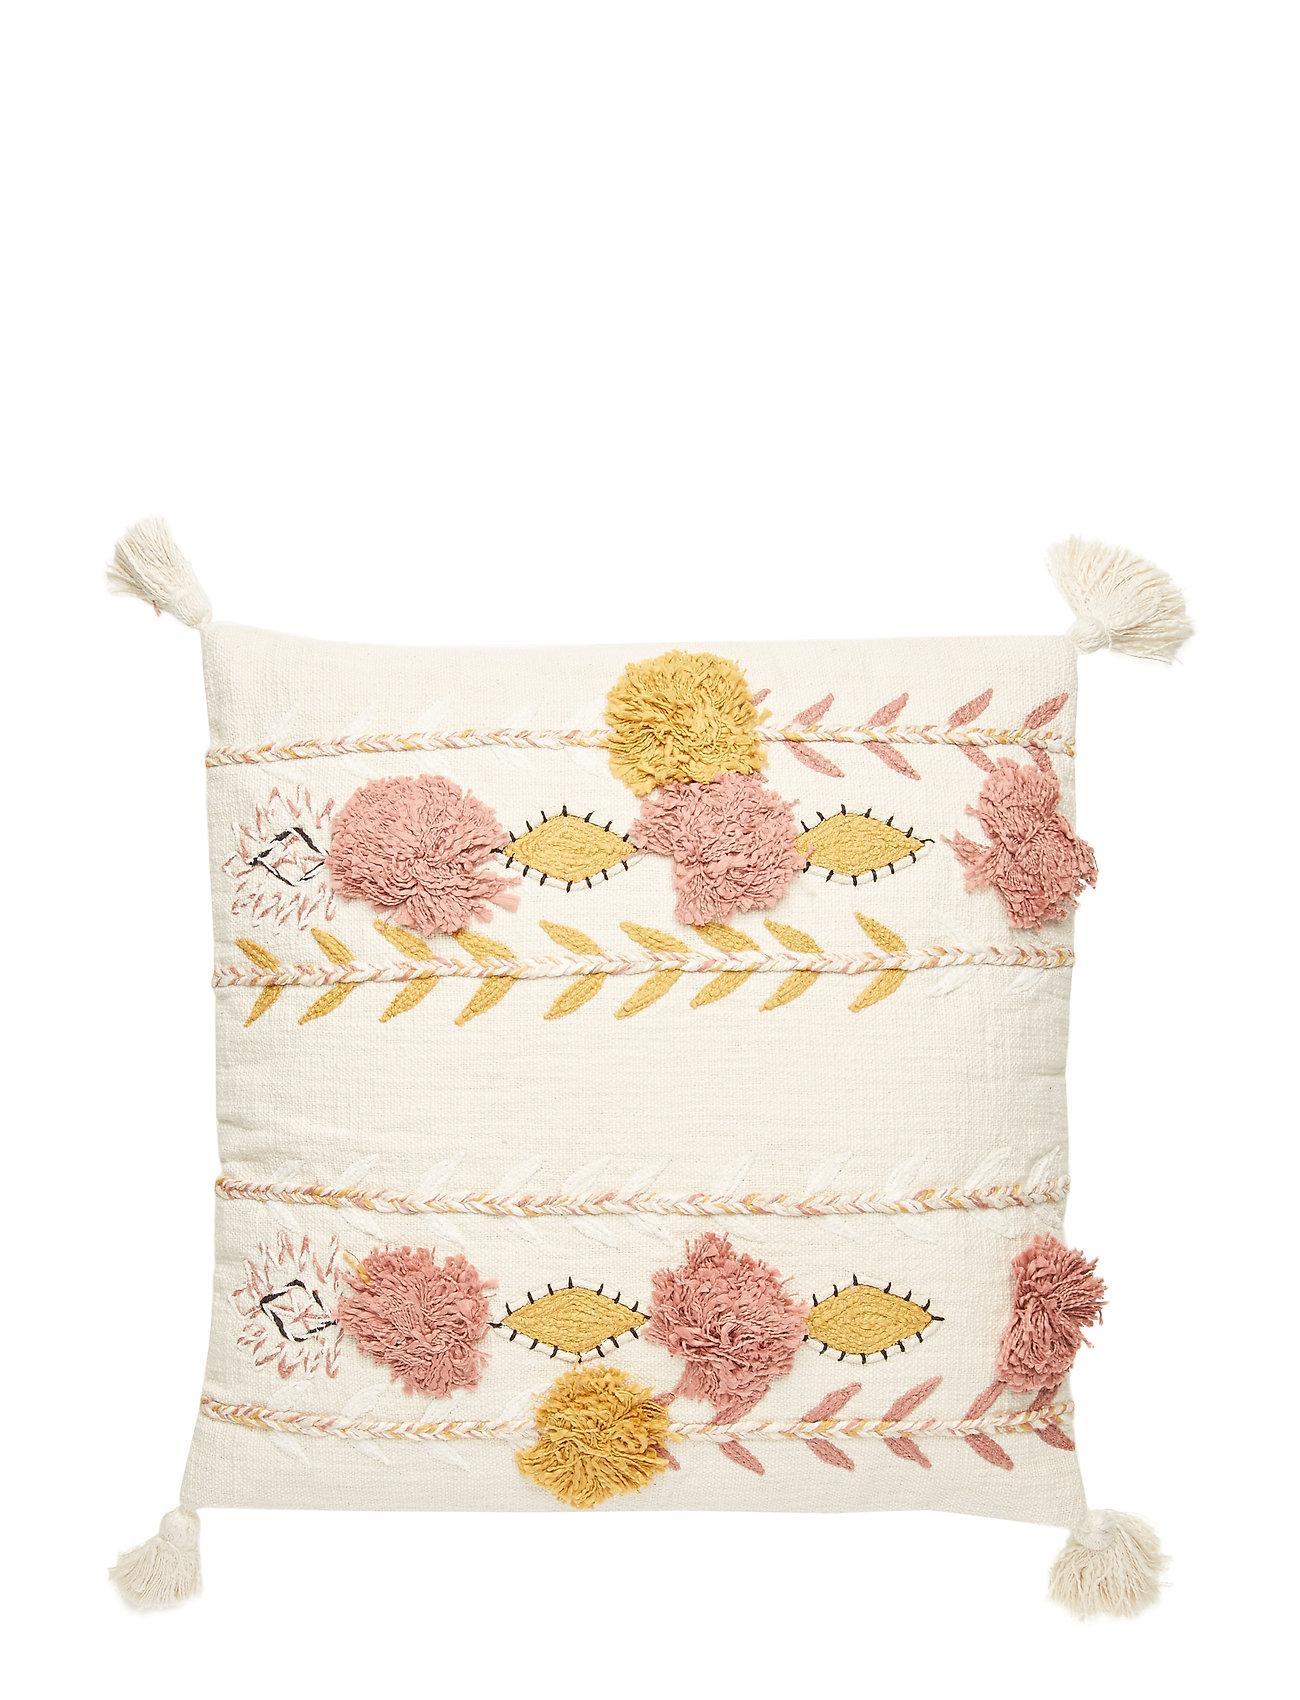 Bloomingville cushion - NATURE